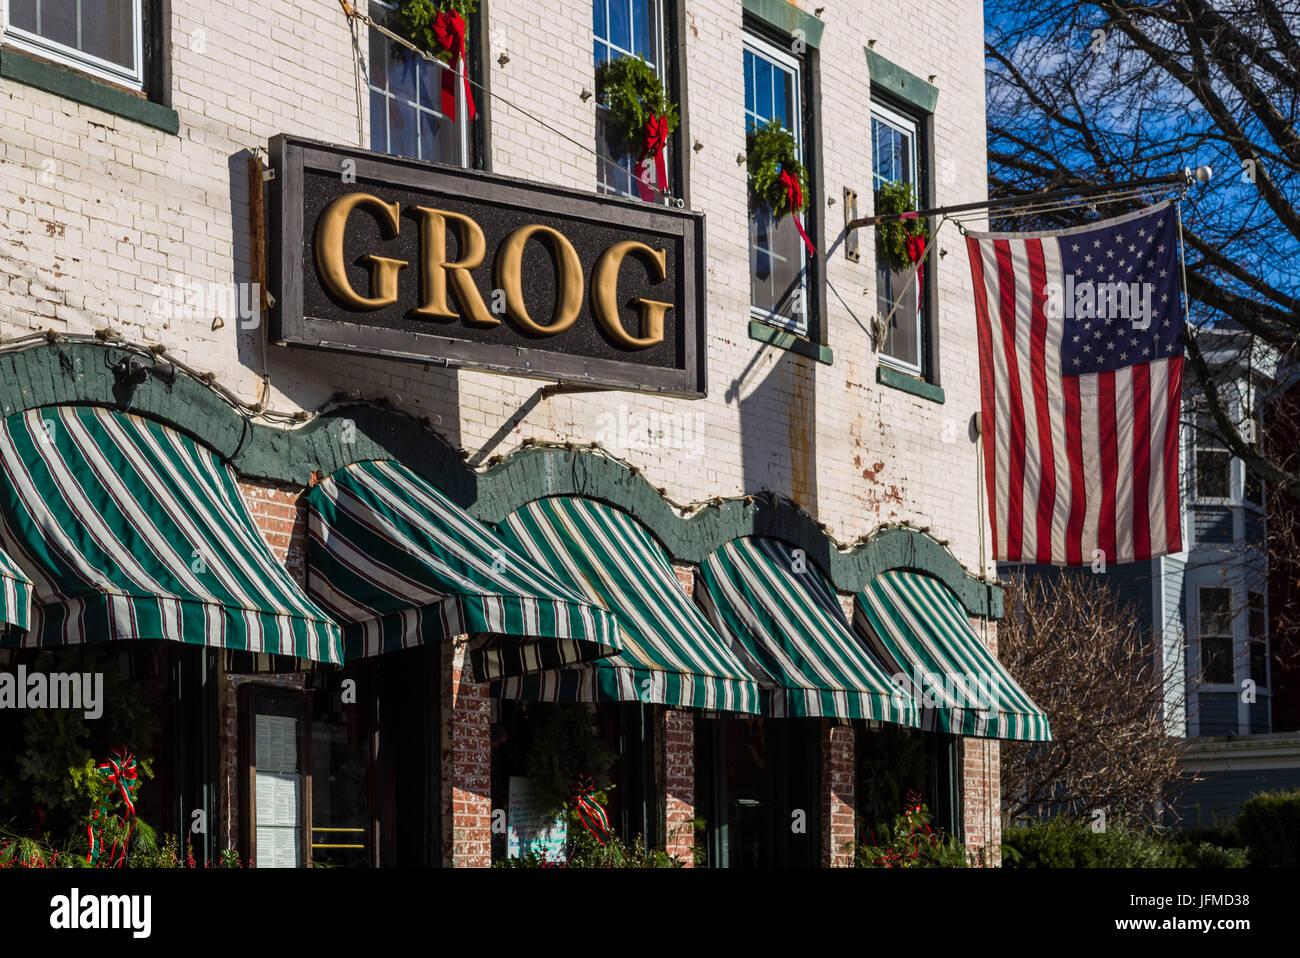 USA, Massachusetts, Newburyport, The Grog Pub, Middle Street - Stock Image